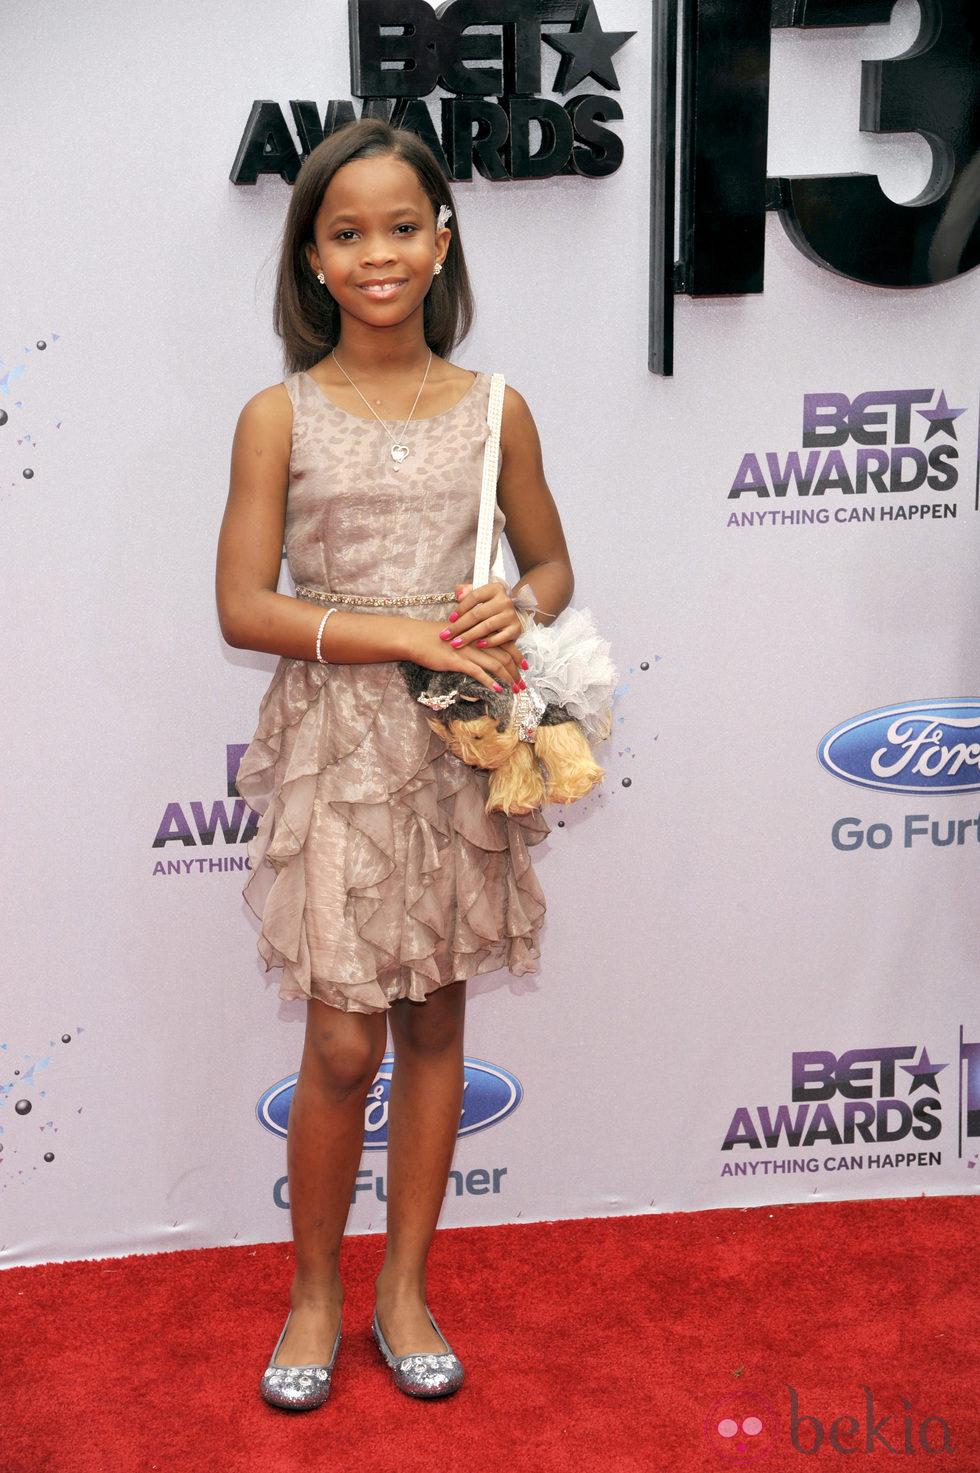 Quvenzhané Wallis en los BET Awards 2013